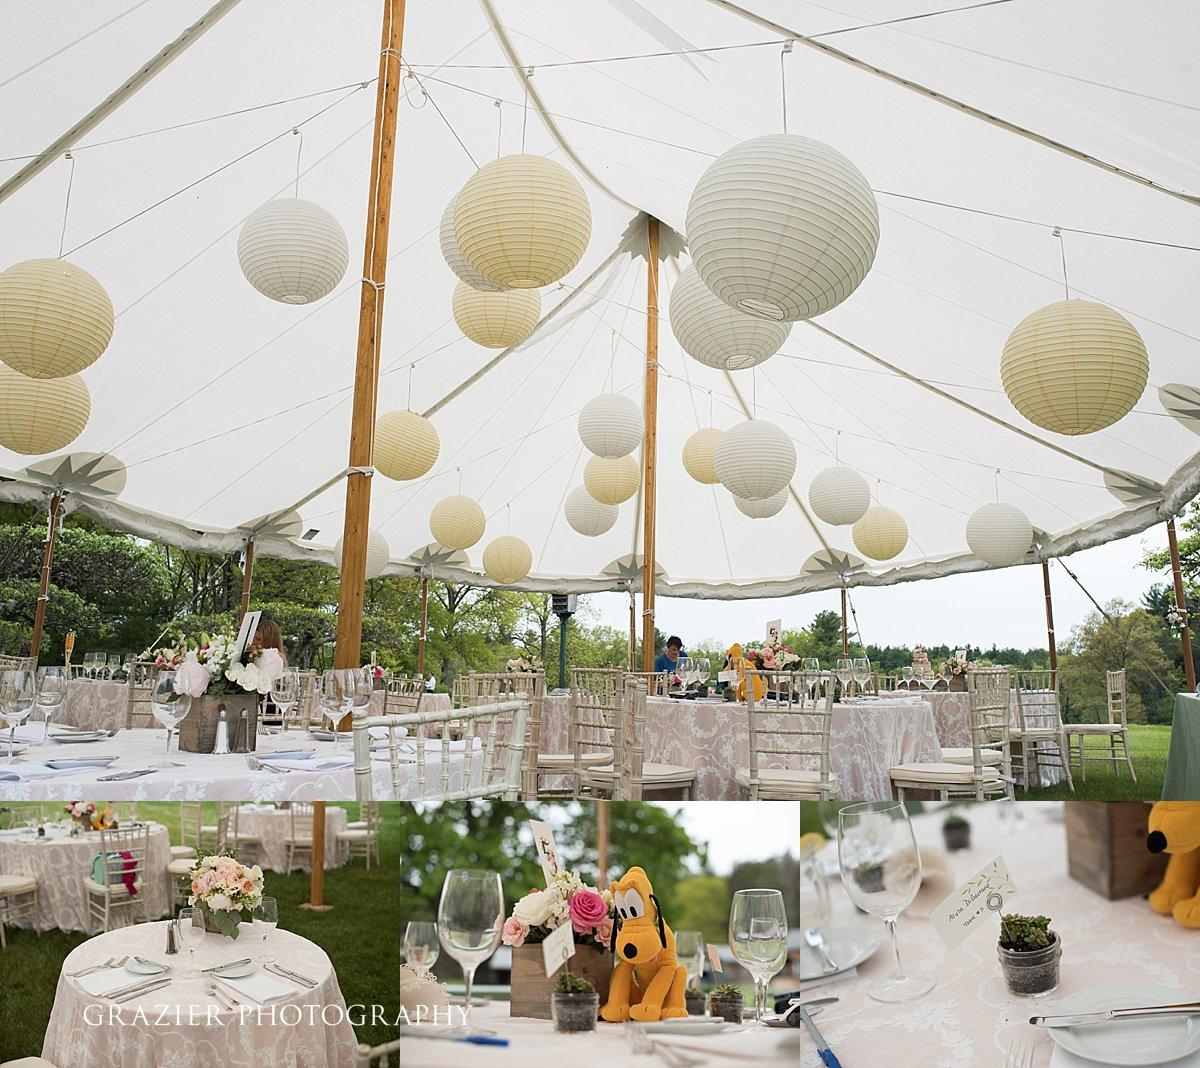 0750_GrazierPhotography_Farm_Wedding_052016.JPG